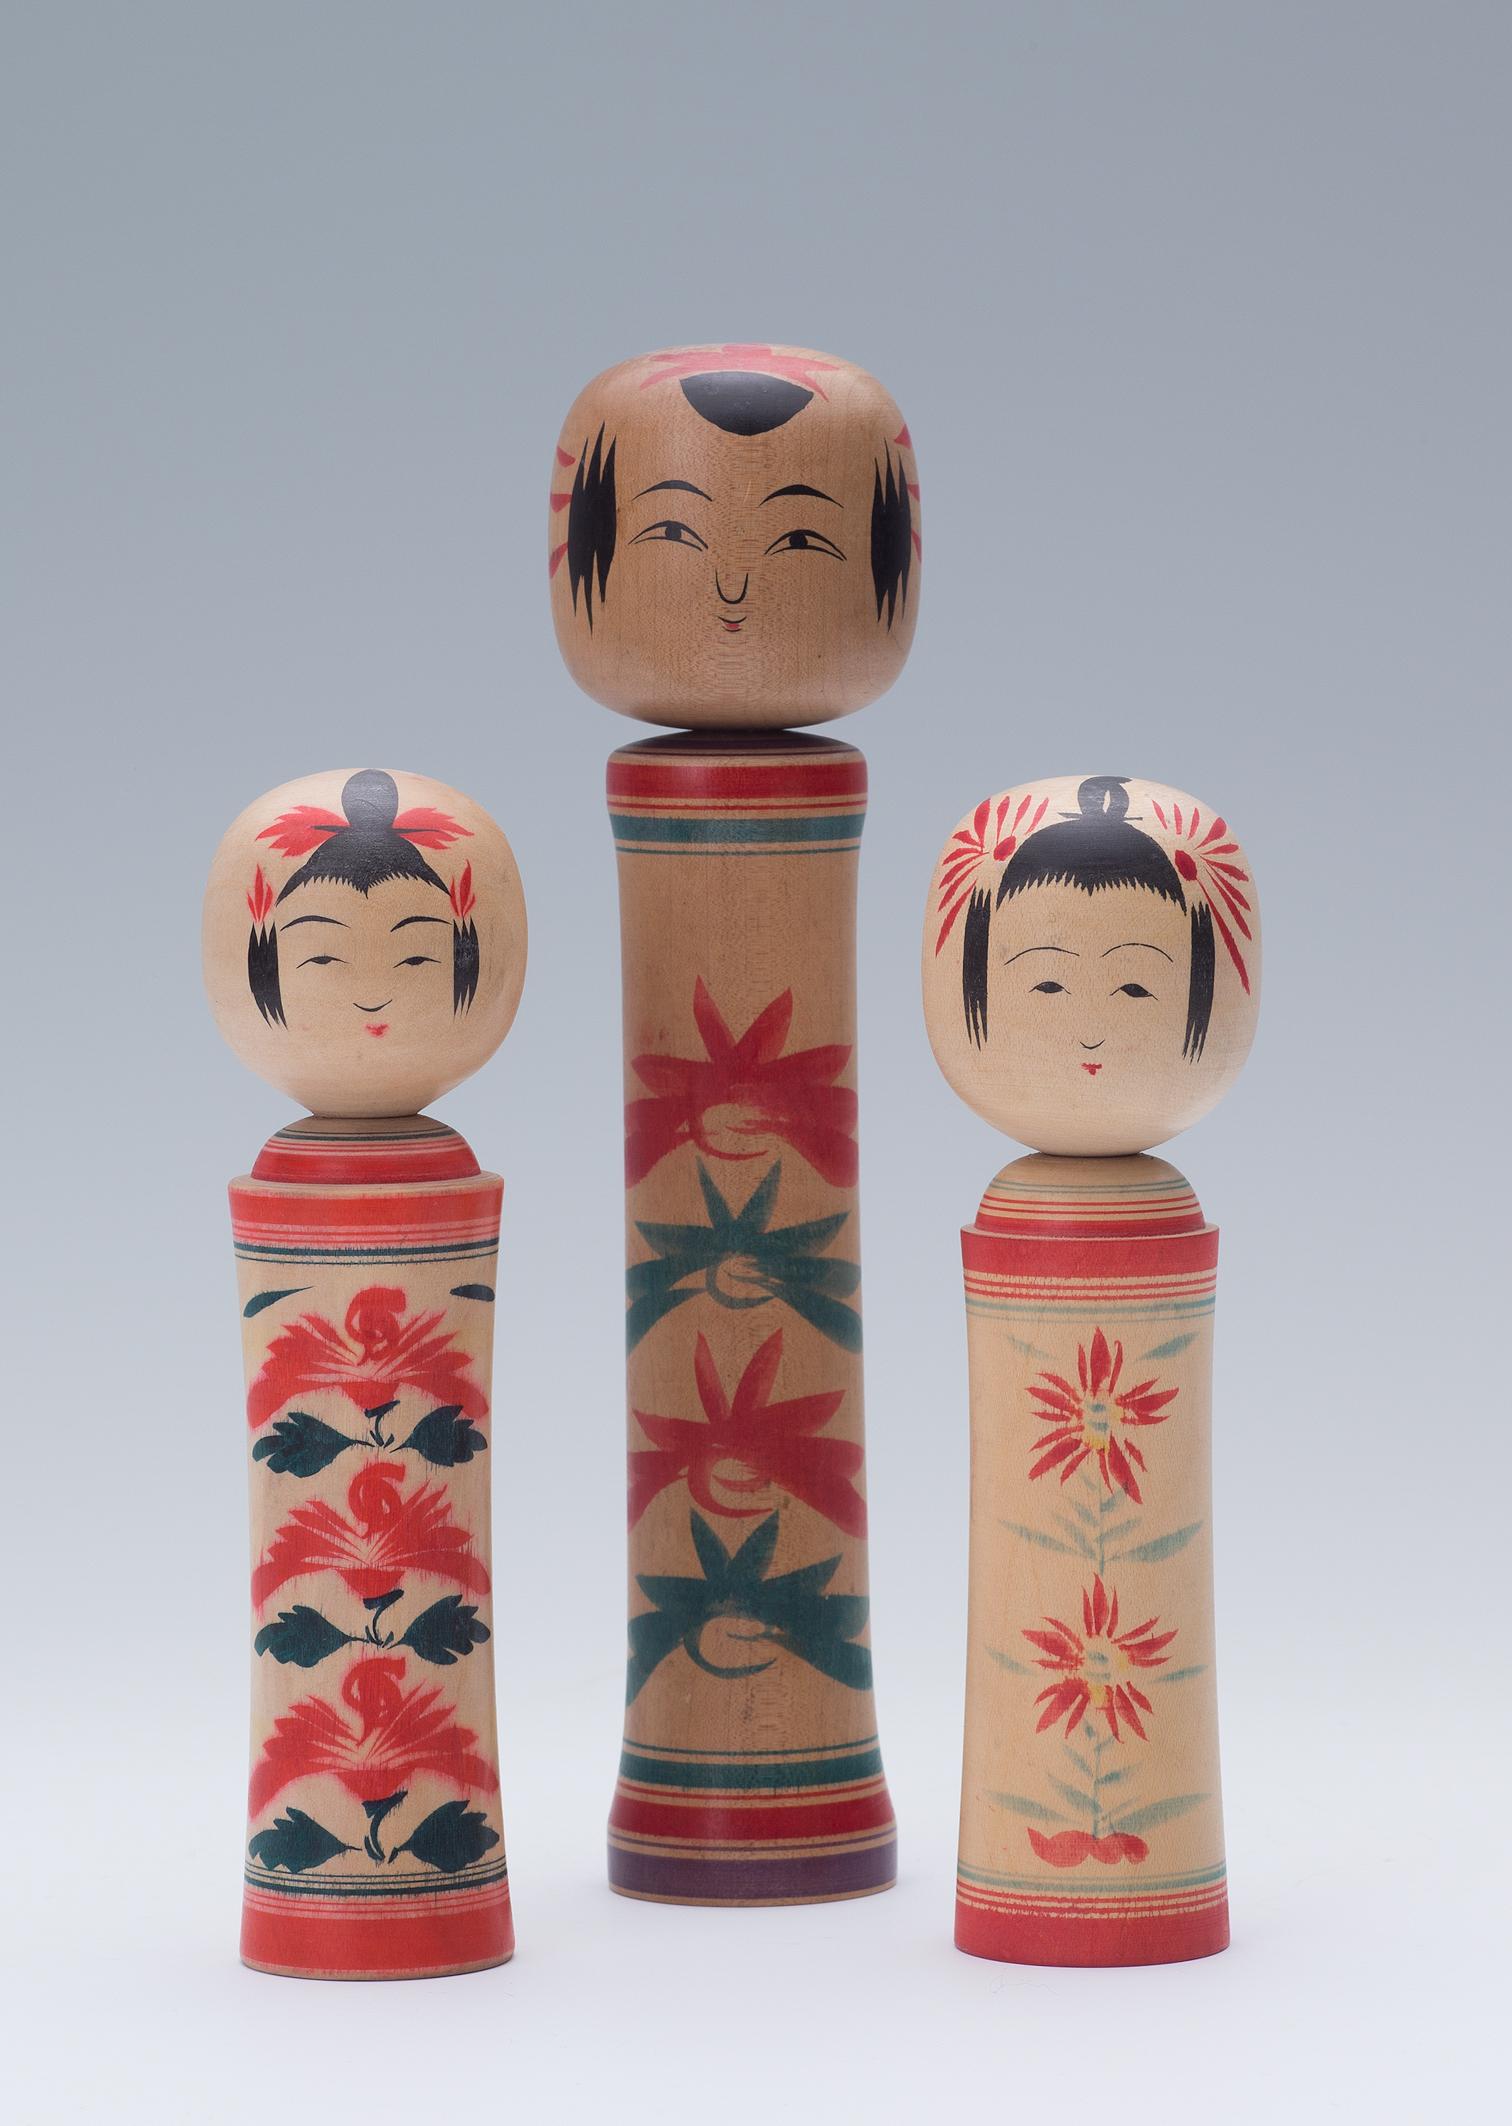 http://www.kameimuseum.or.jp/topics/2013/03/24/%E3%81%93%E3%81%91%E3%81%9706.jpg